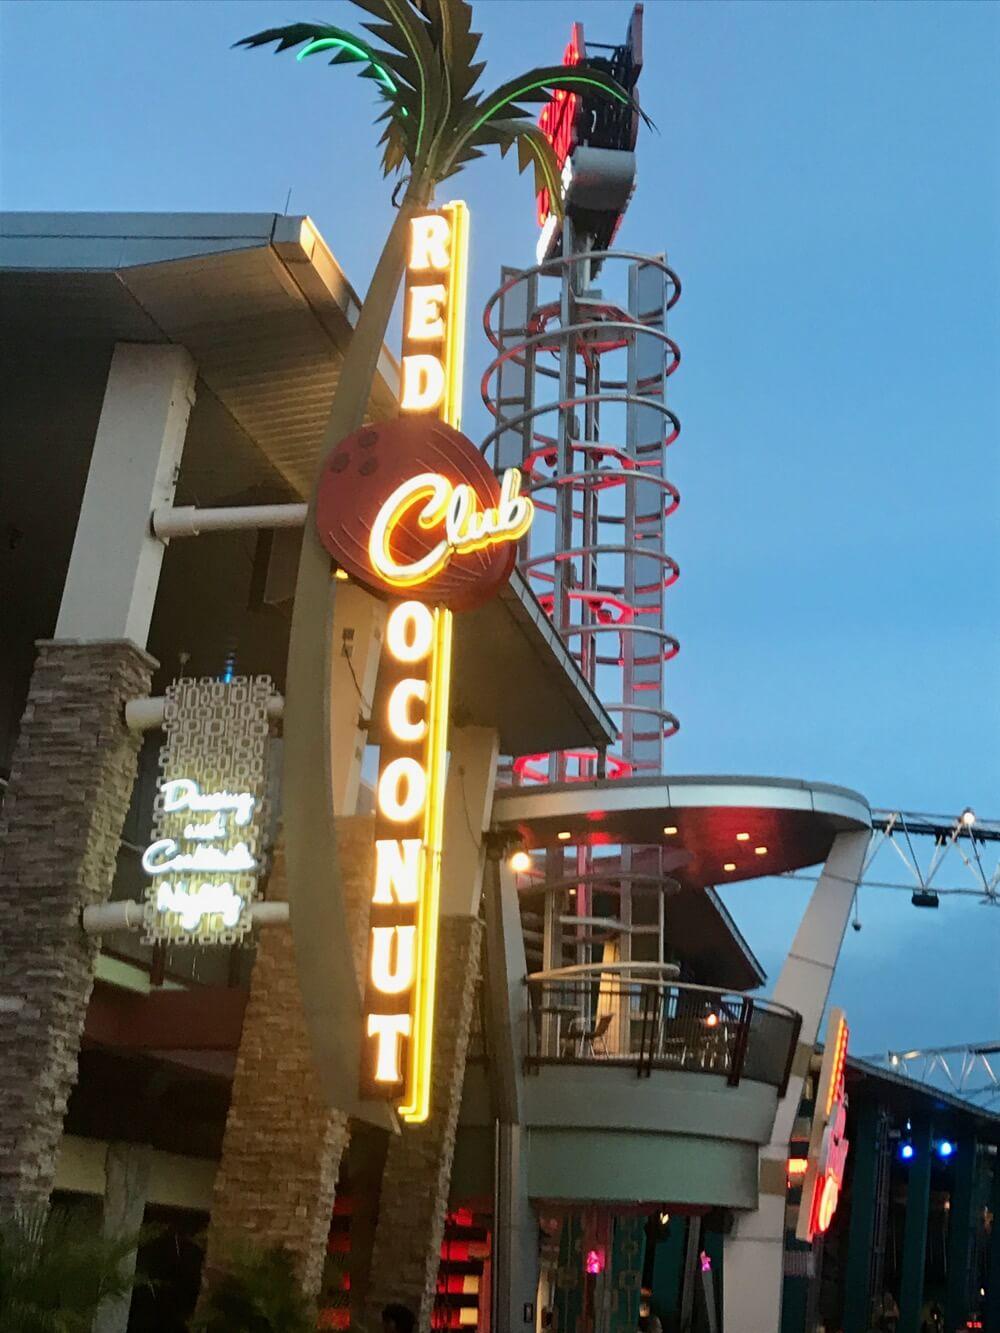 Universal CityWalk Orlando - CityWalk Red Coconut Club